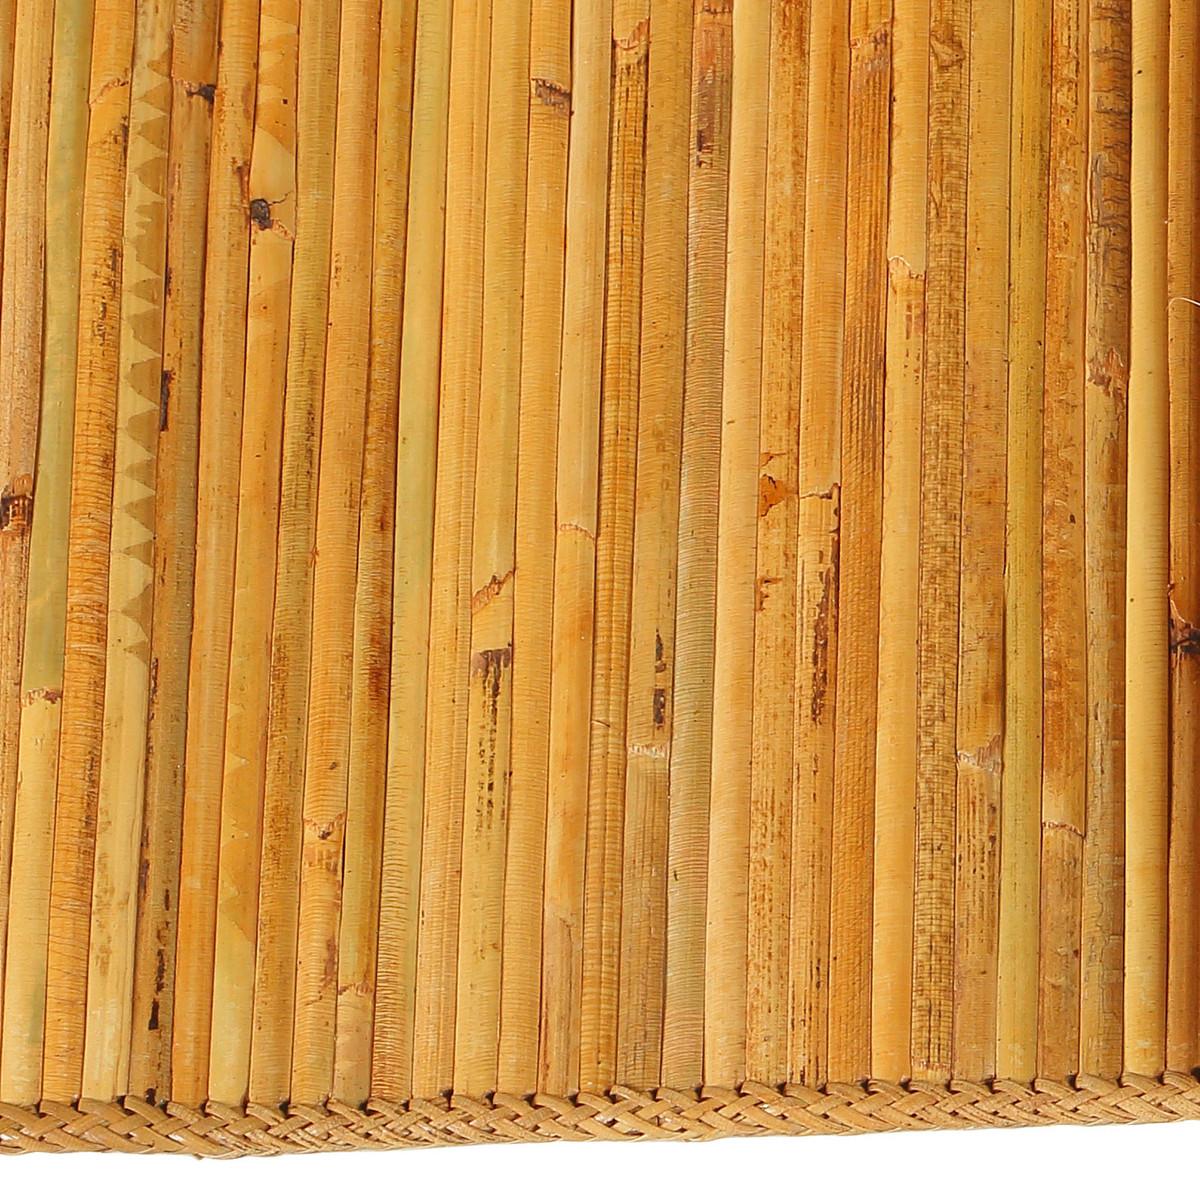 bali natural bamboo area rug, 5' x 8' (ja-rg-nb-5x8) - joseph allen Bamboo Area Rug